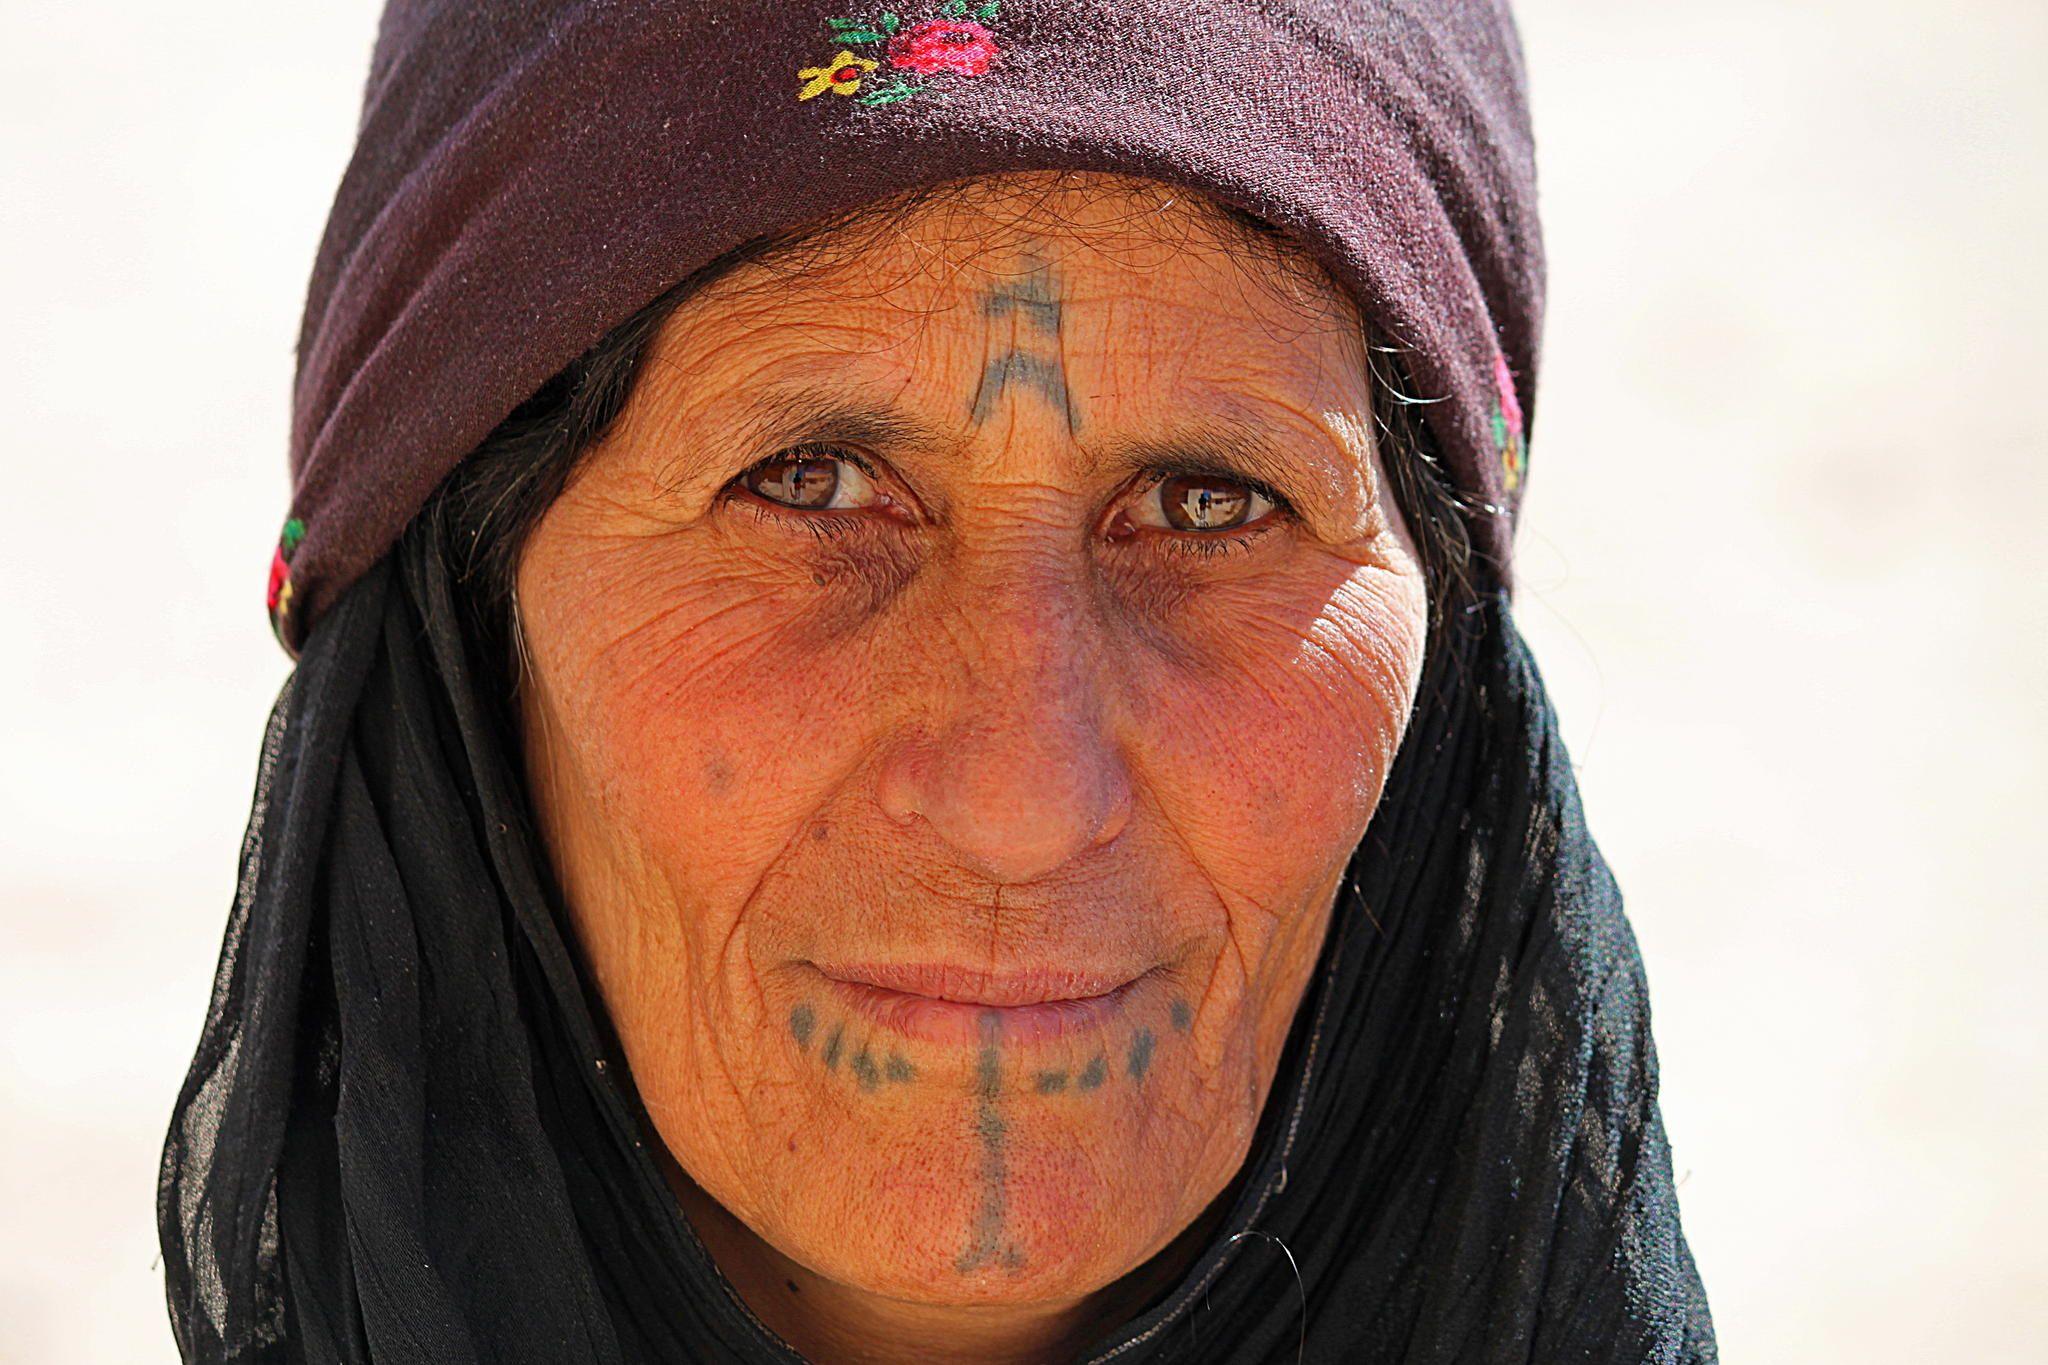 Bedouin Grandmother by RawRisqArt (Rawan Risheq) on 500px